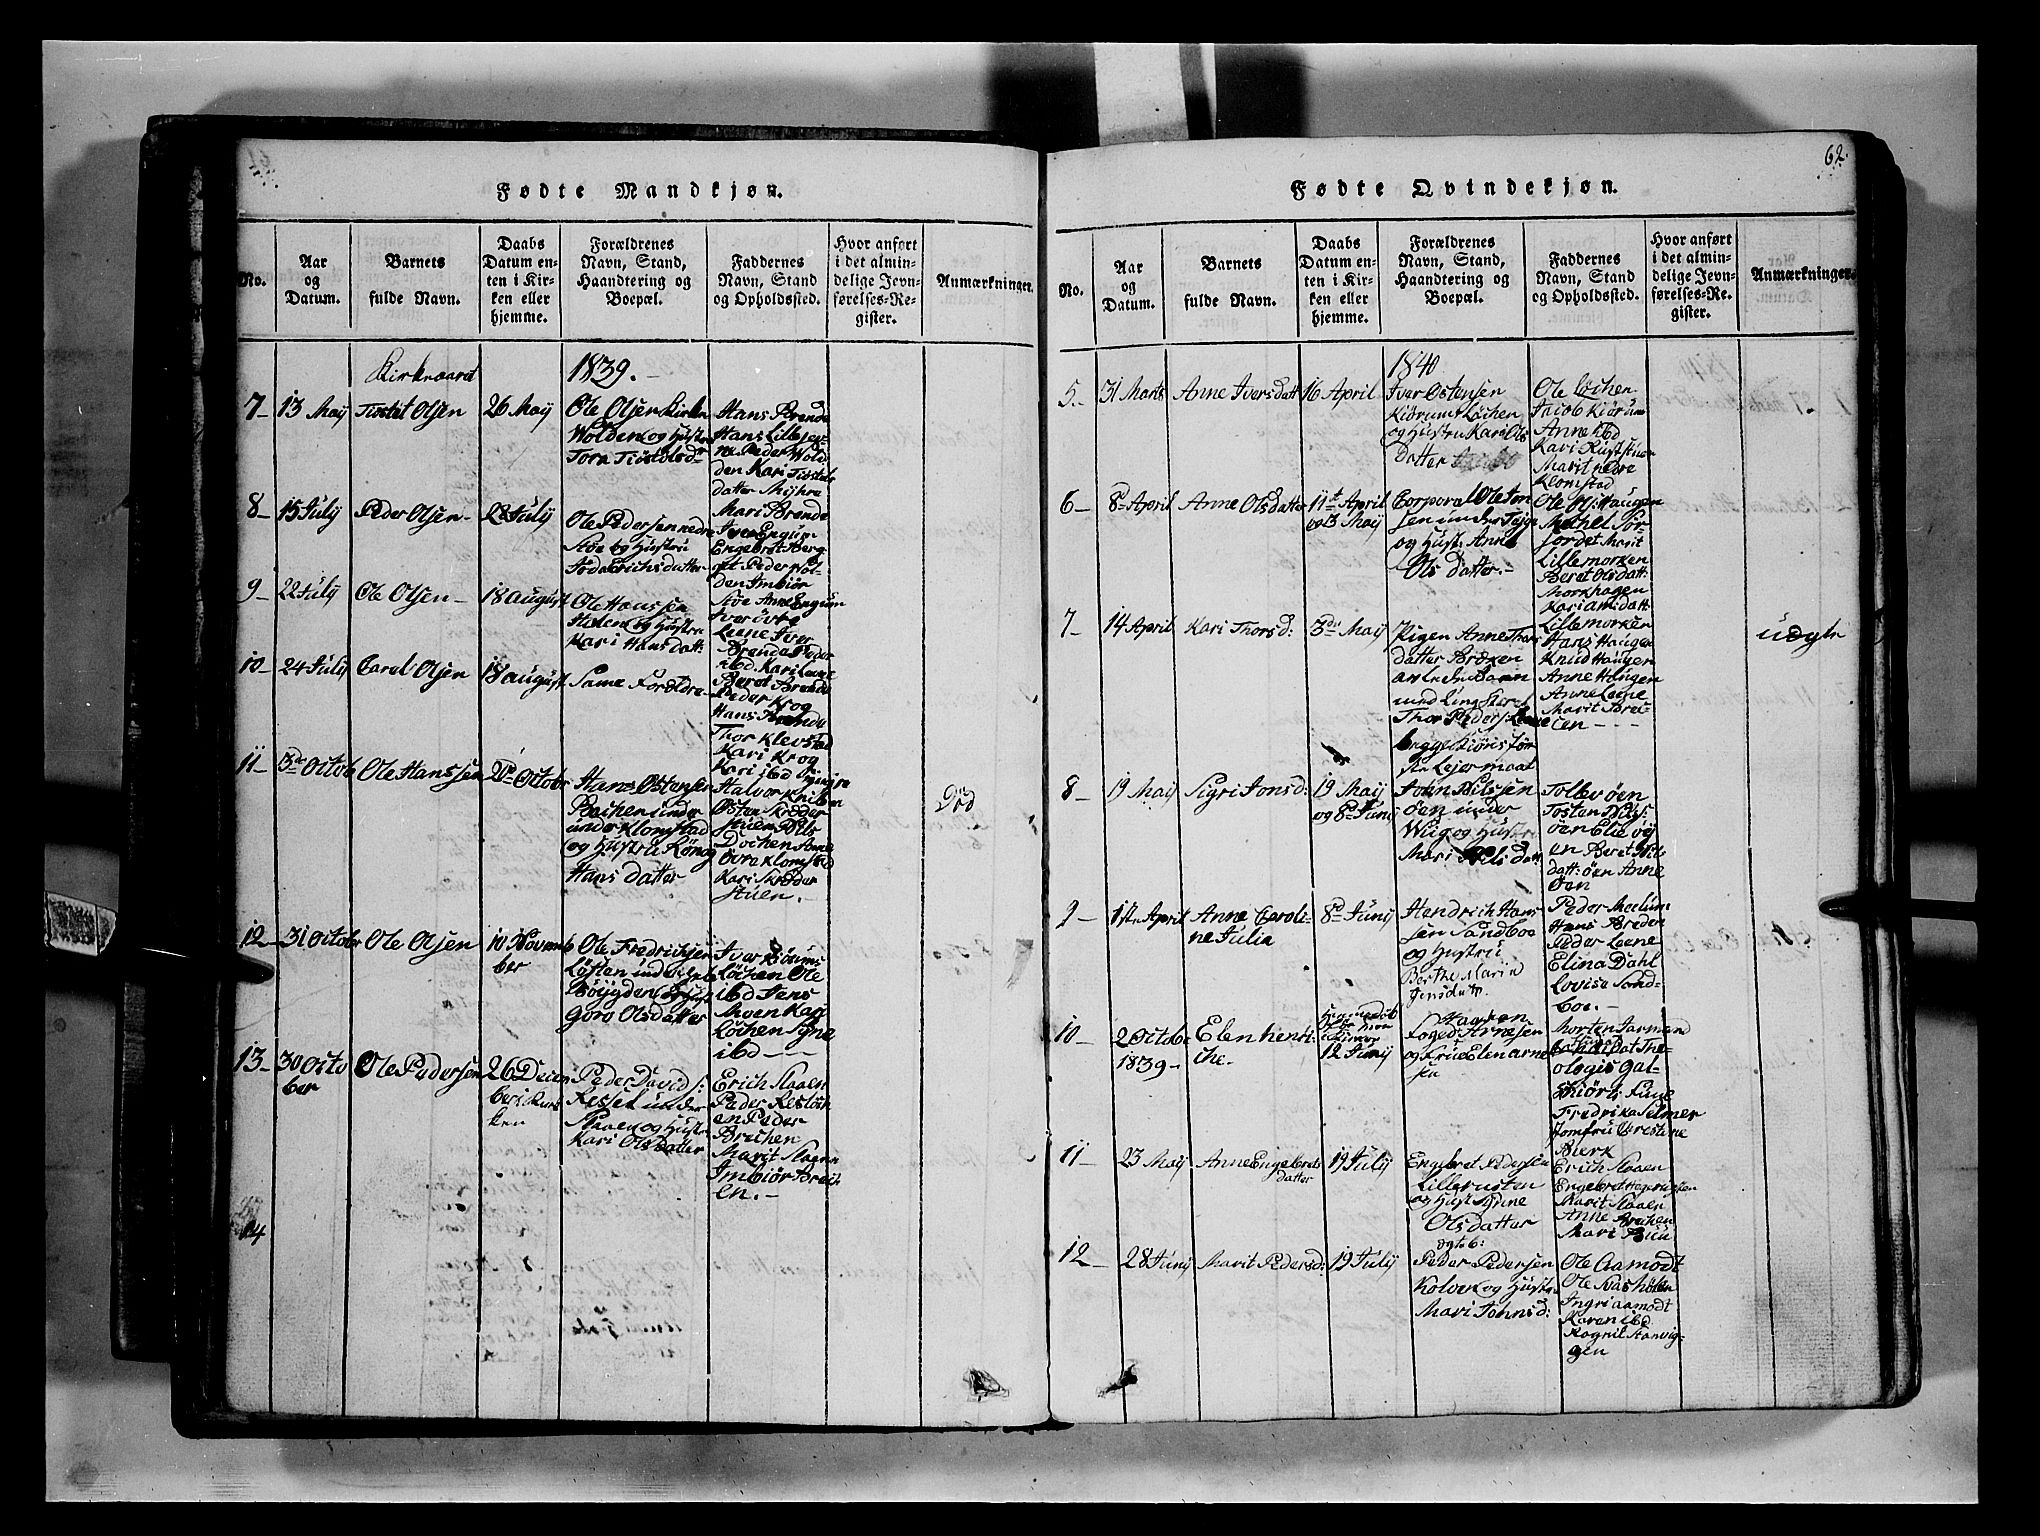 SAH, Fron prestekontor, H/Ha/Hab/L0002: Klokkerbok nr. 2, 1816-1850, s. 62